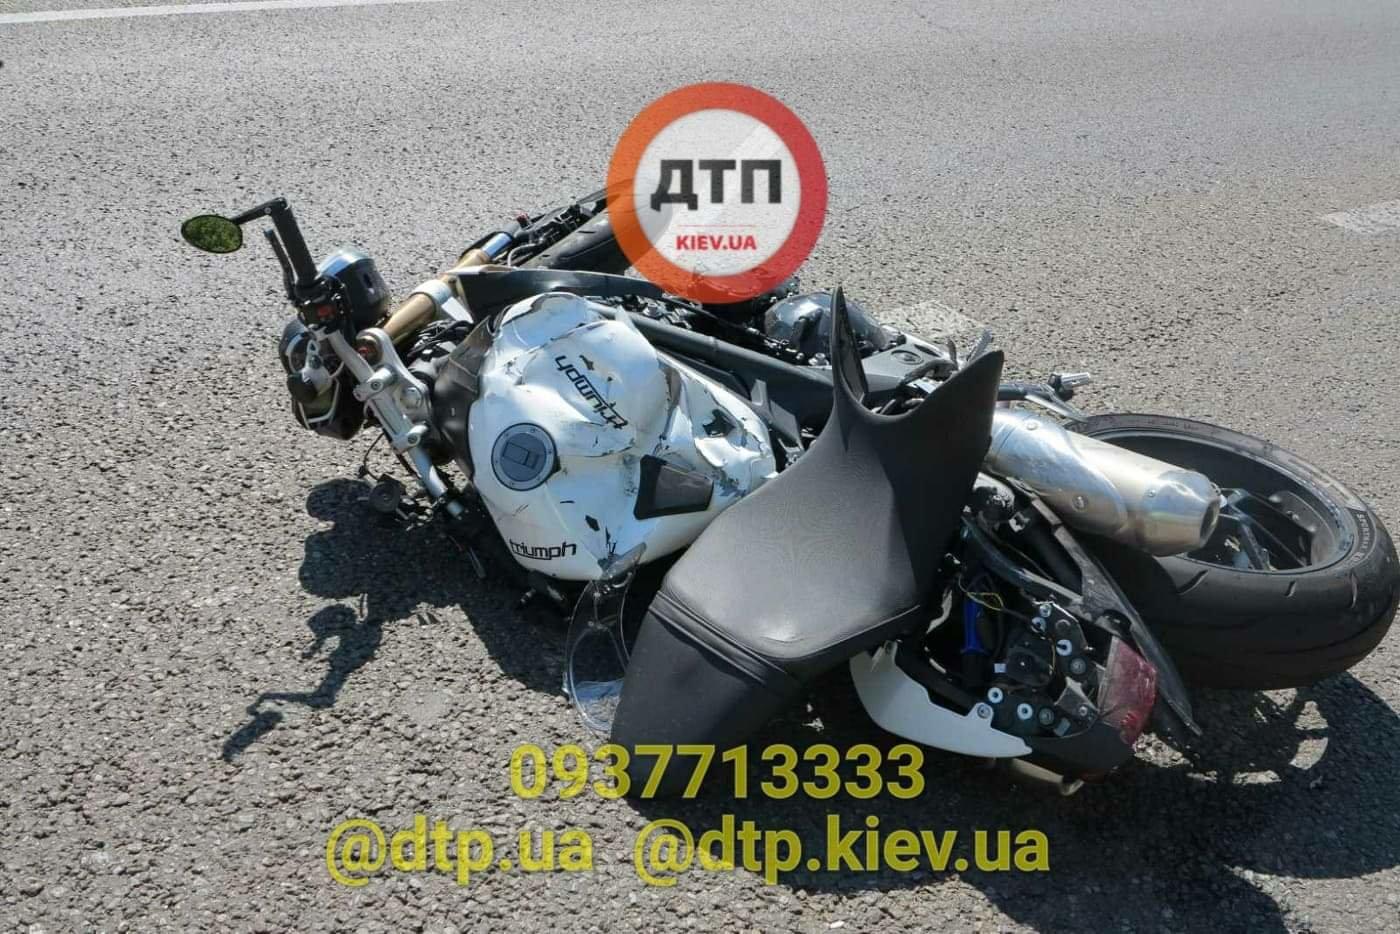 В Киеве произошло серьезное ДТП: легковушка сбила мотоциклиста - ФОТО, фото-4